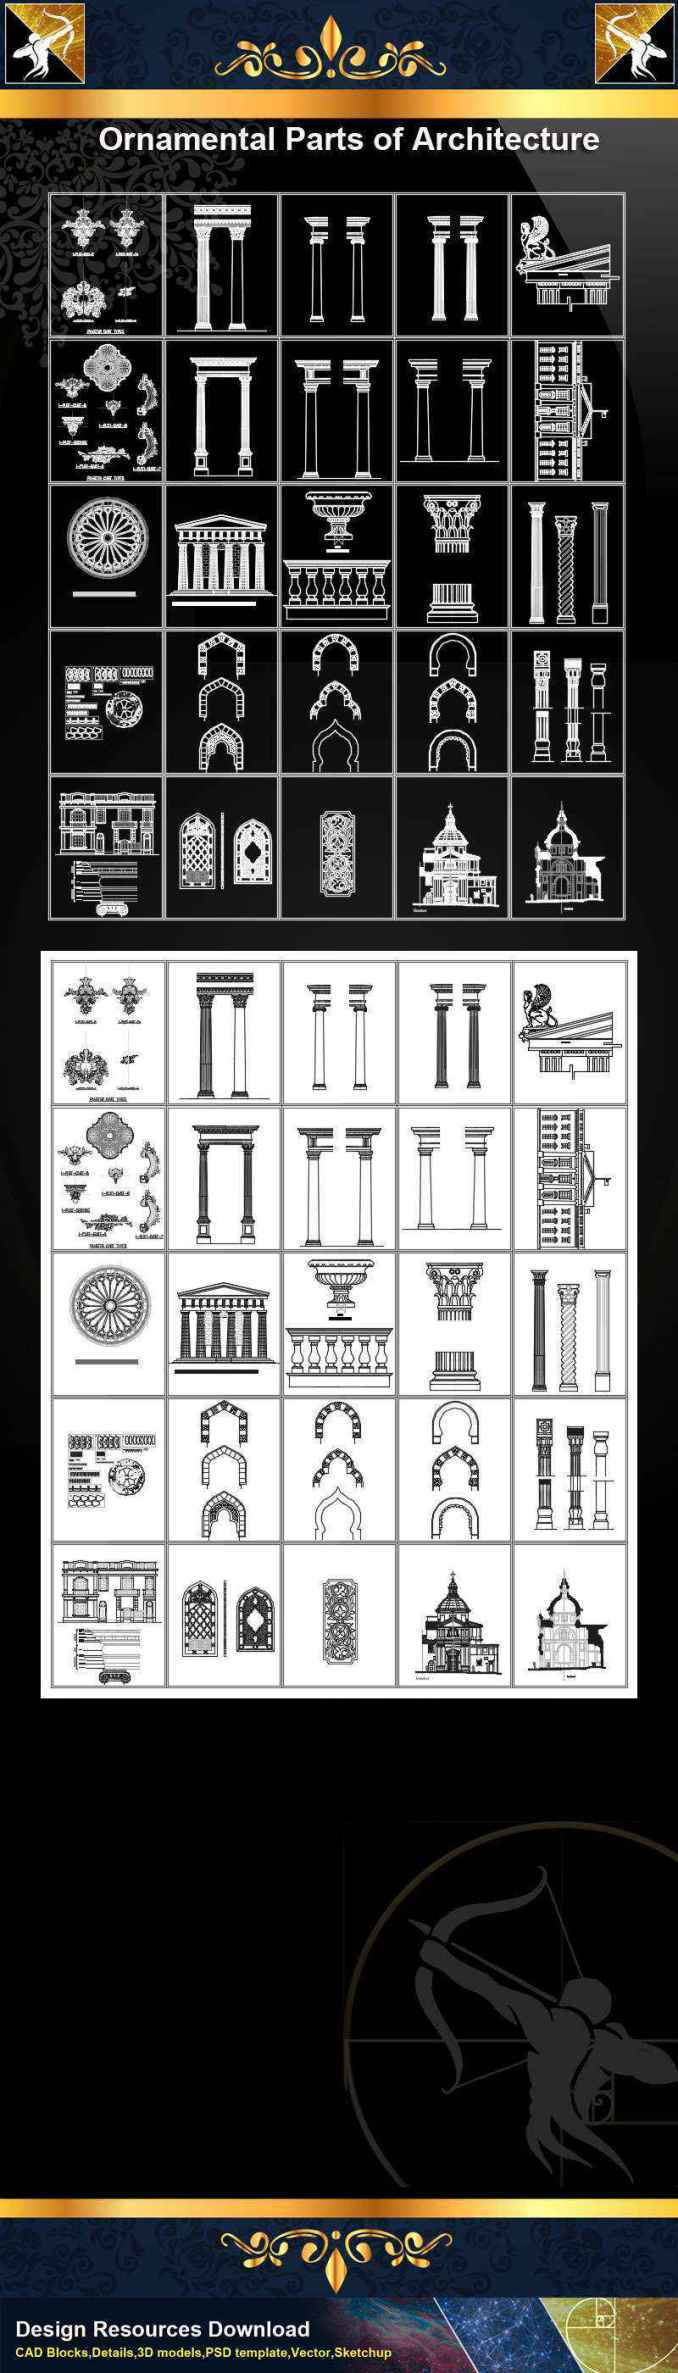 ★【Ornamental Parts of Architecture -Decoration Element CAD Blocks  V 2】@Autocad Decoration Blocks,Drawings,CAD Details,Elevation